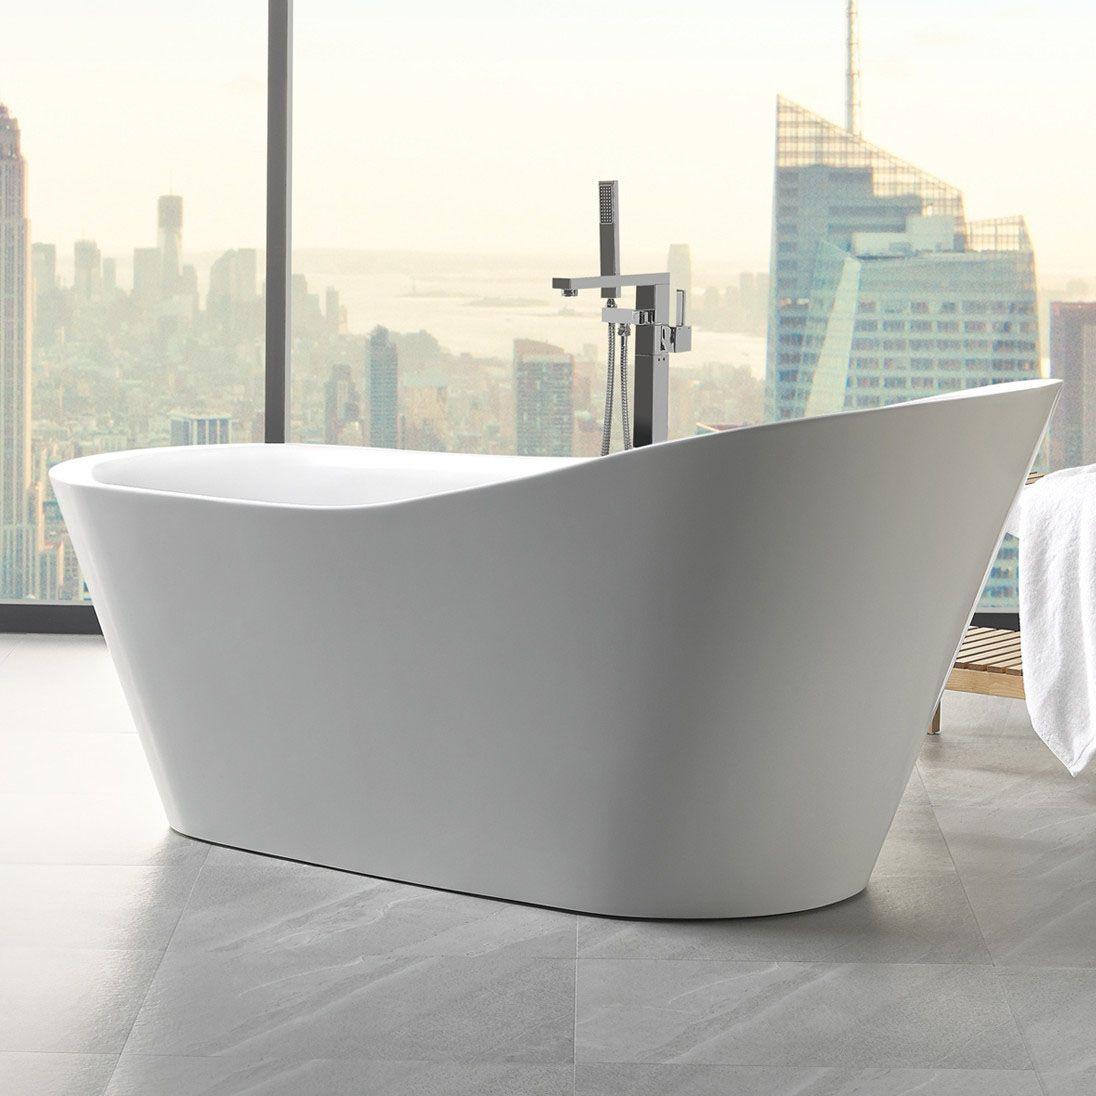 Eviva Emely Acrylic Tub 71″ Free Standing High-end Bathtub EVTB1014 ...